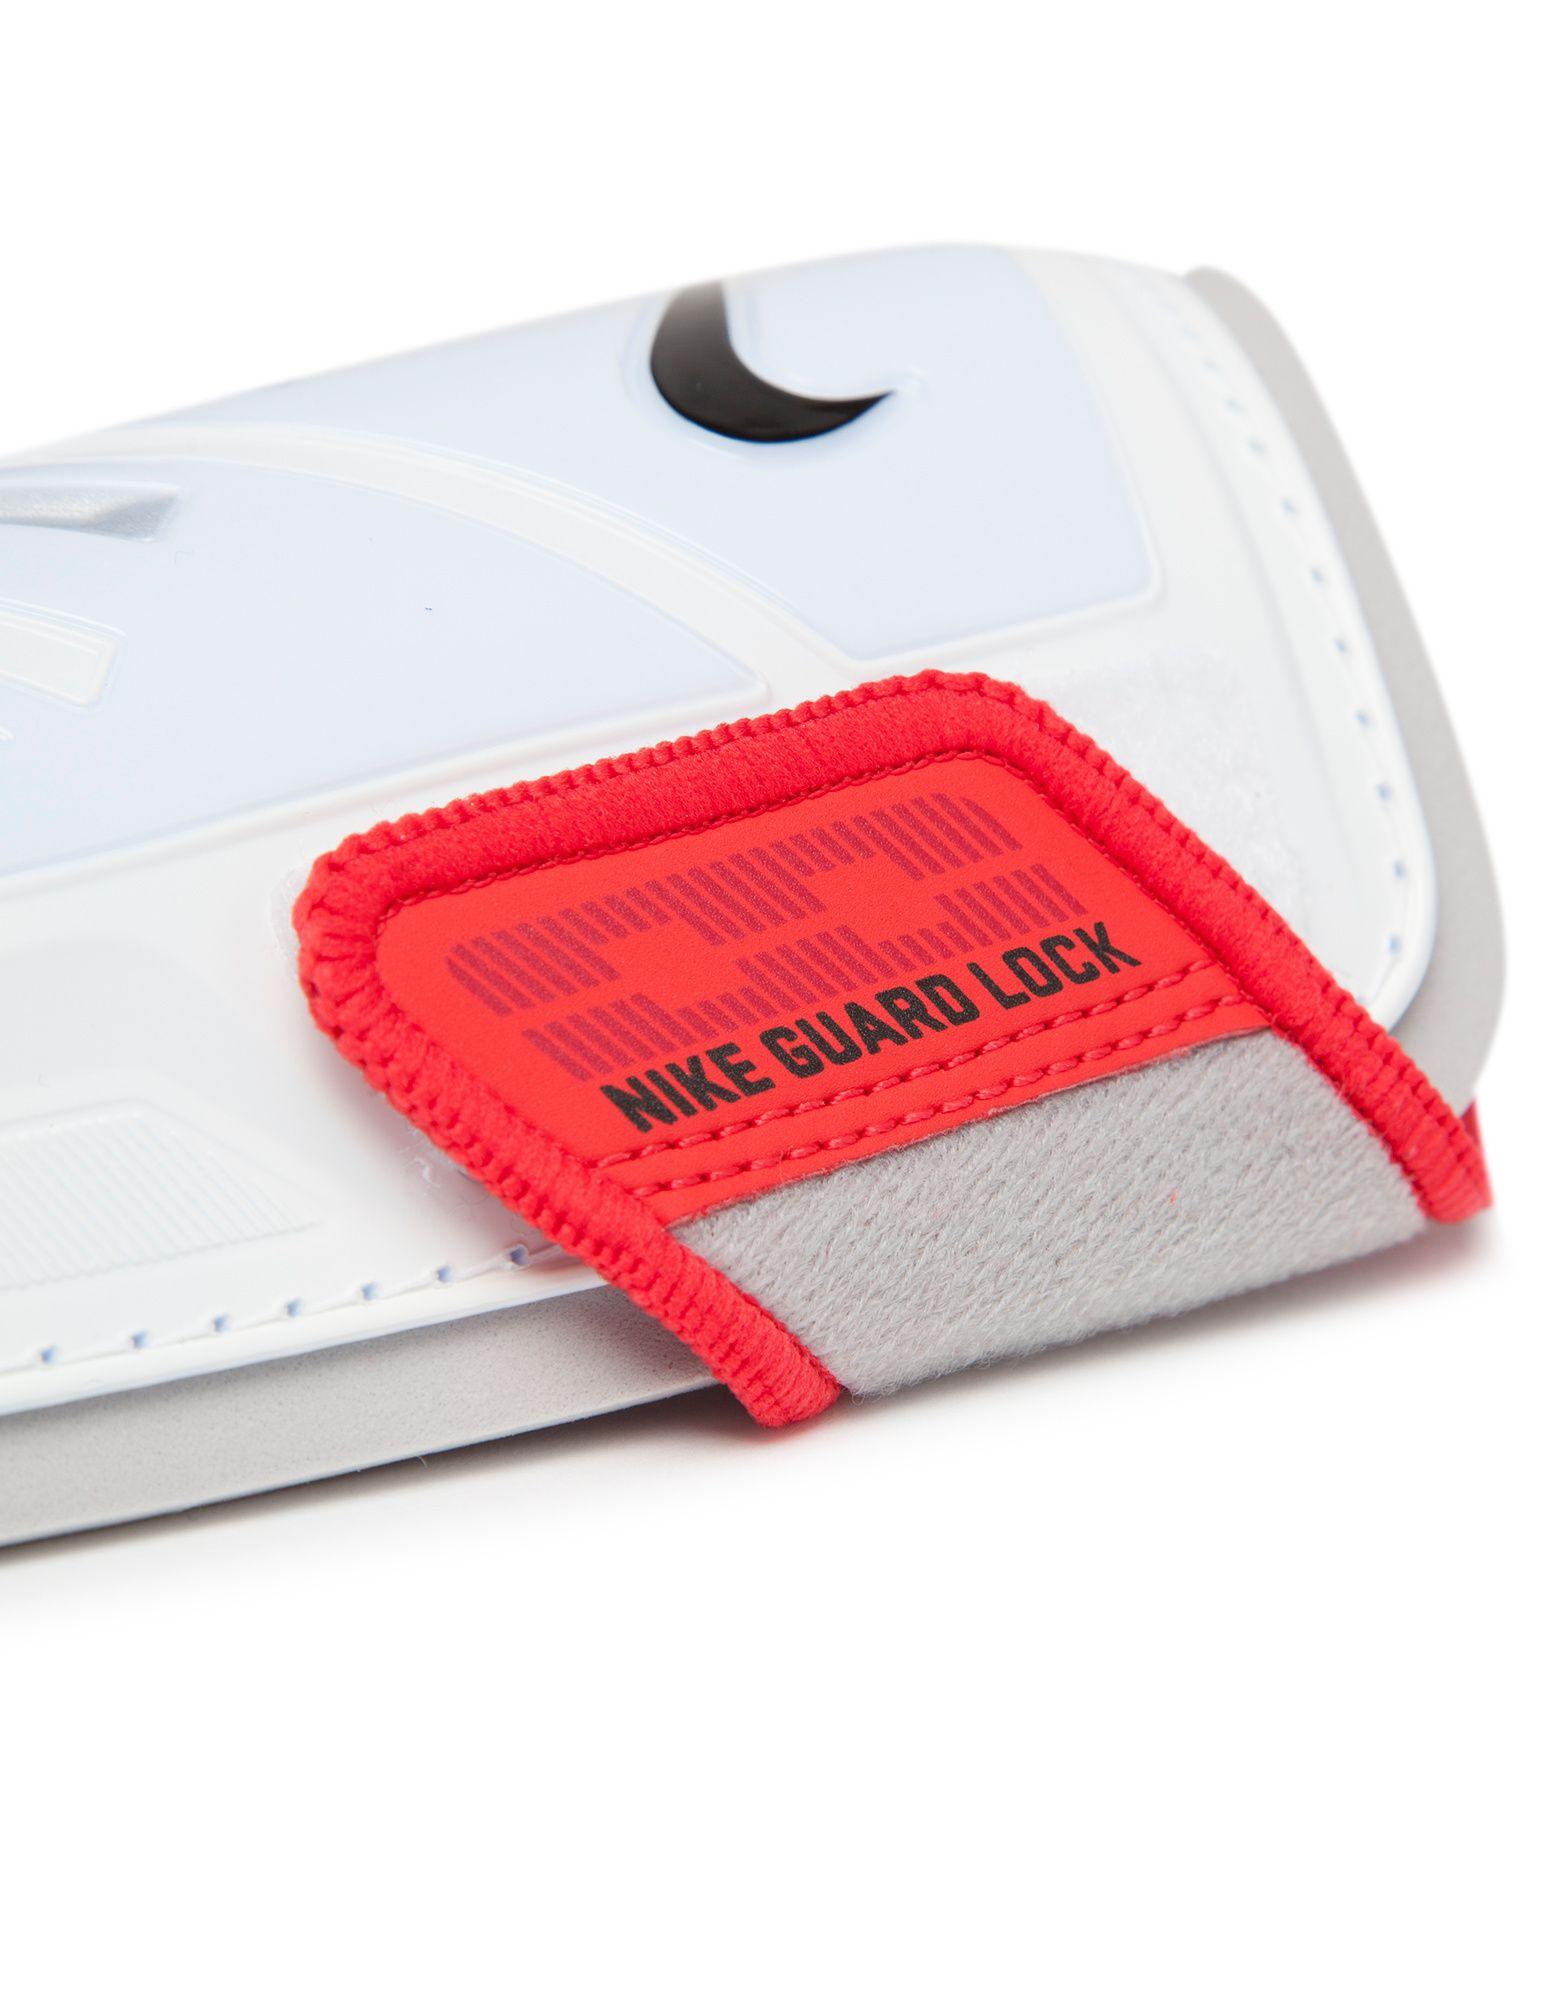 Nike T90 Protegga Shield III Shinpads